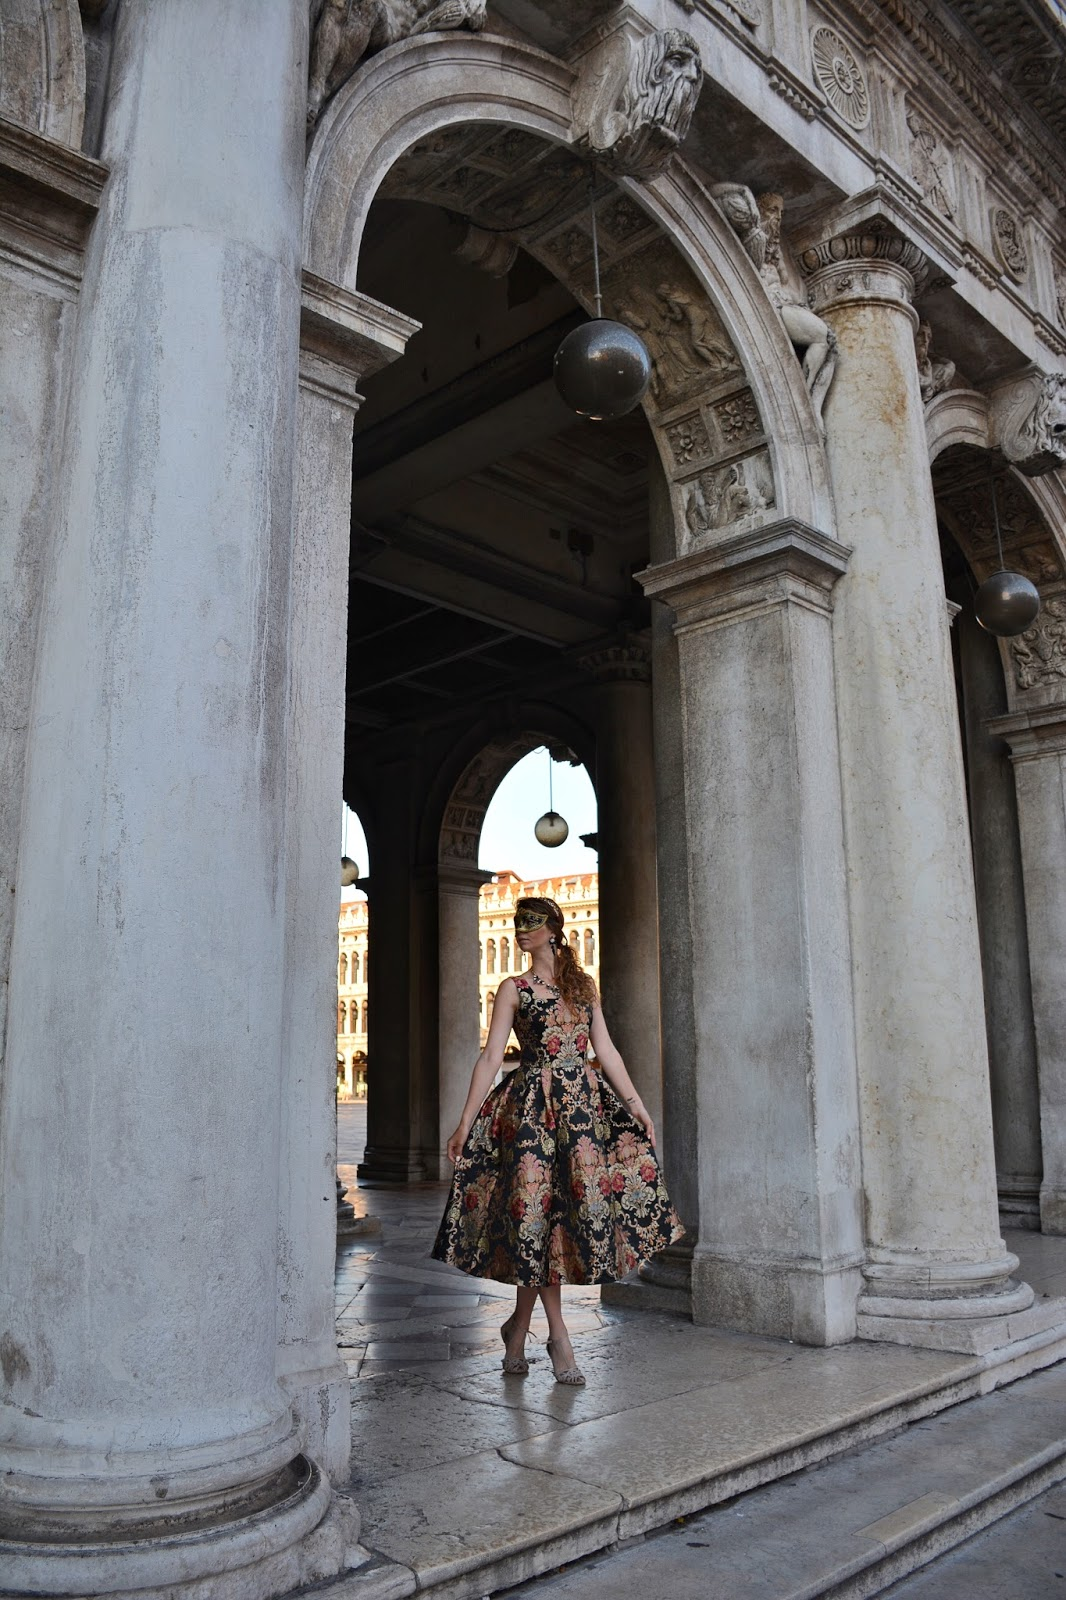 венецианский карнавал фотосессия Сан марко